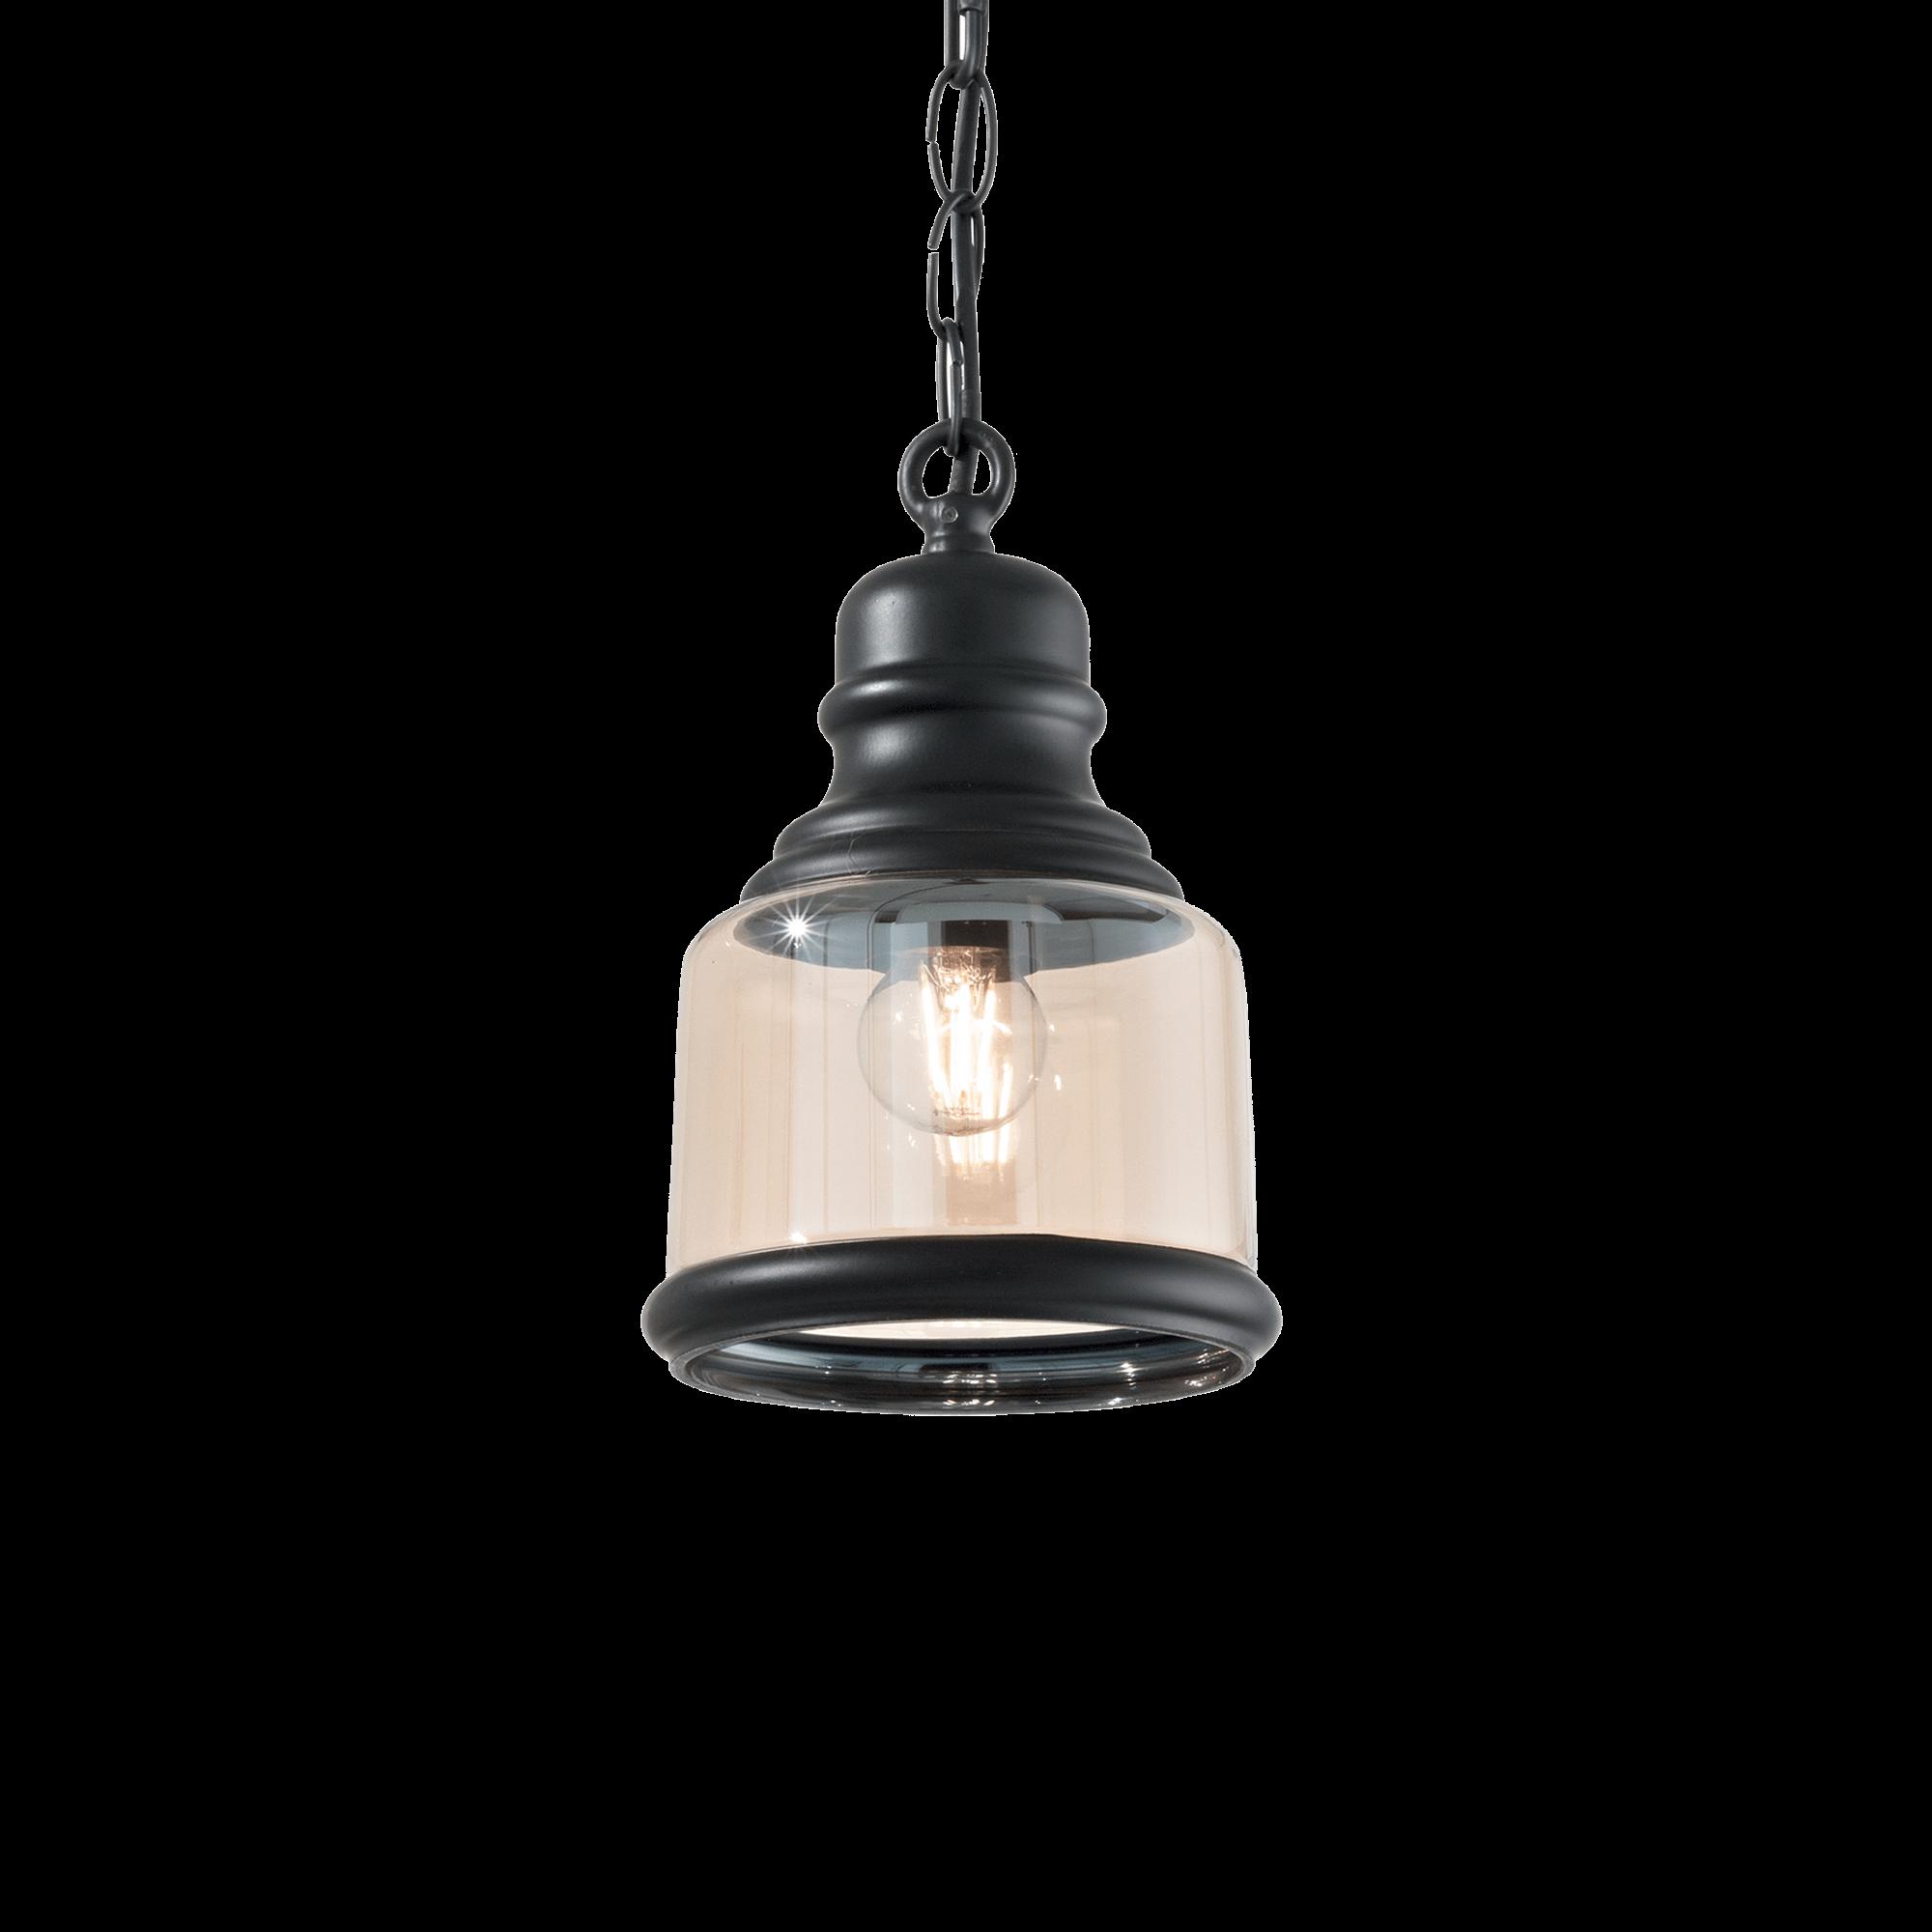 Ideal Lux 168586 HANSEL SP1 SQUARE függeszték